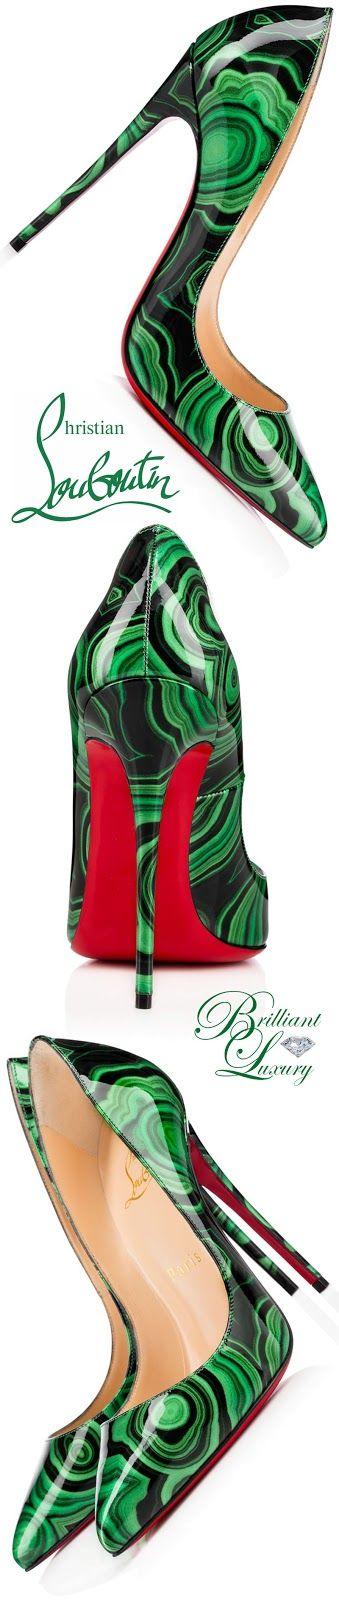 Brilliant Luxury * Christian Louboutin Pigalle Follies Patent Malachite Pumps